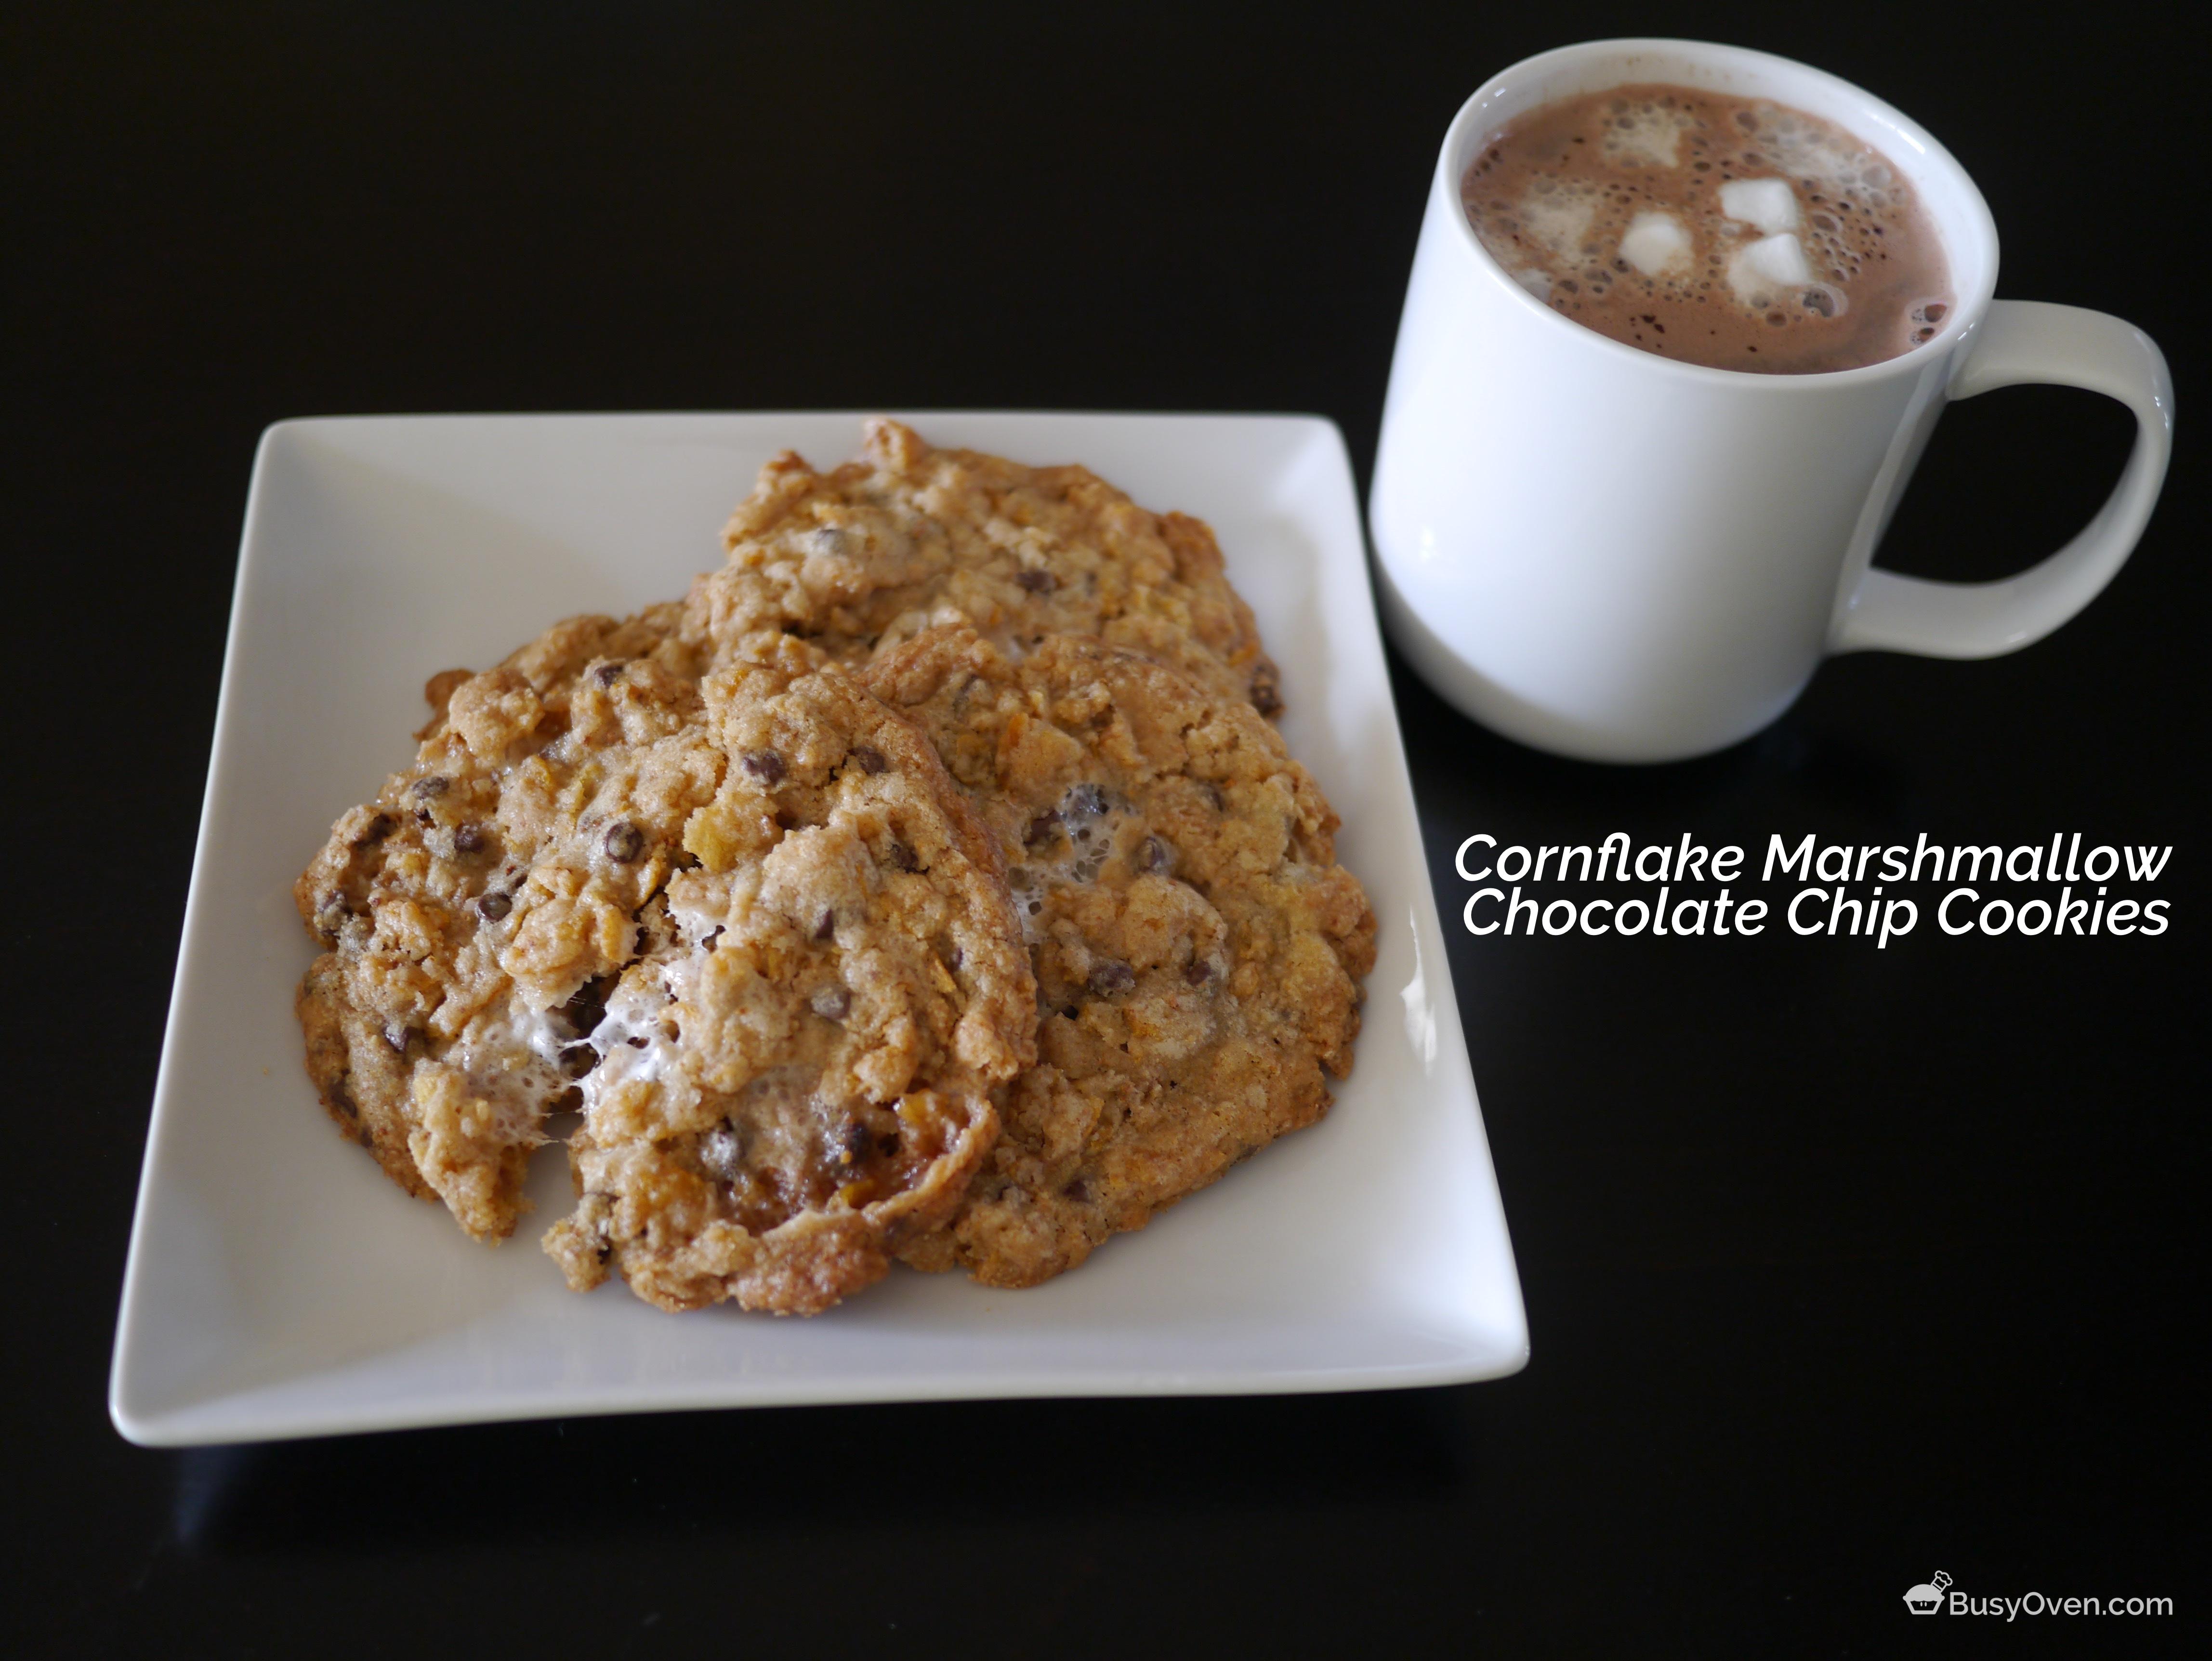 Cornflake Marshmallow Chocolate Chip Cookies